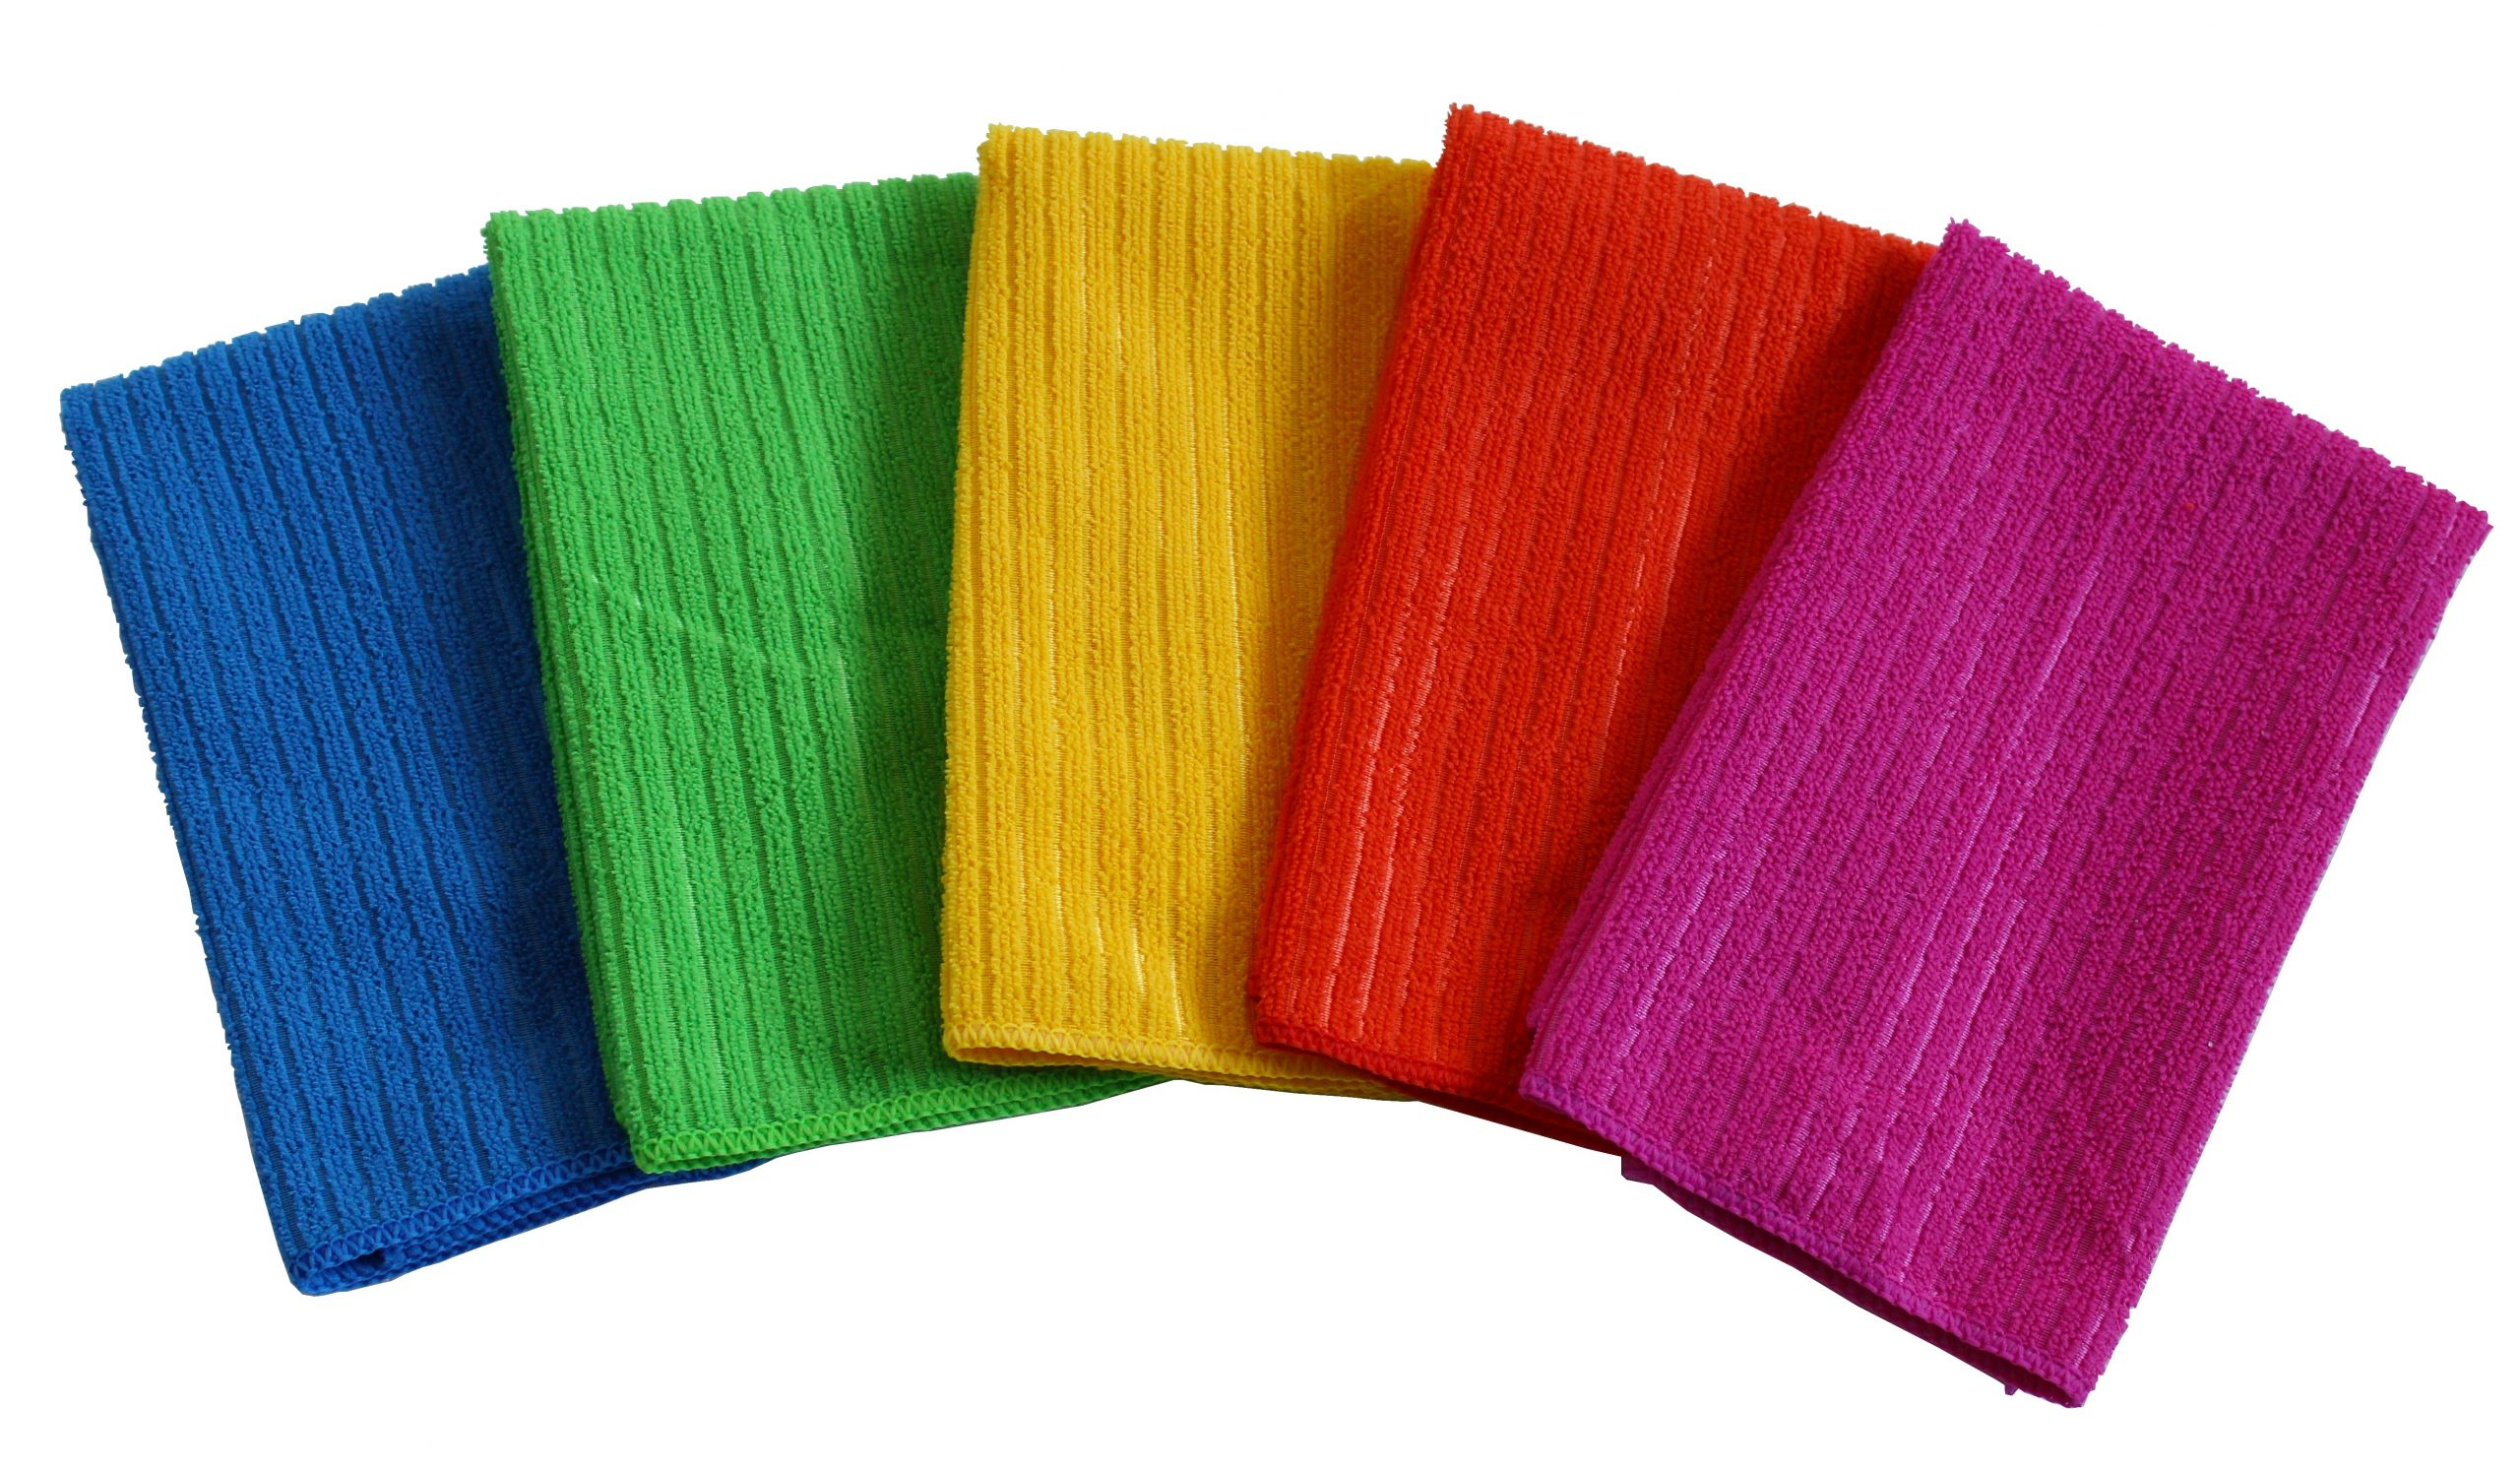 Asciugamano In Microfibra Carrefour